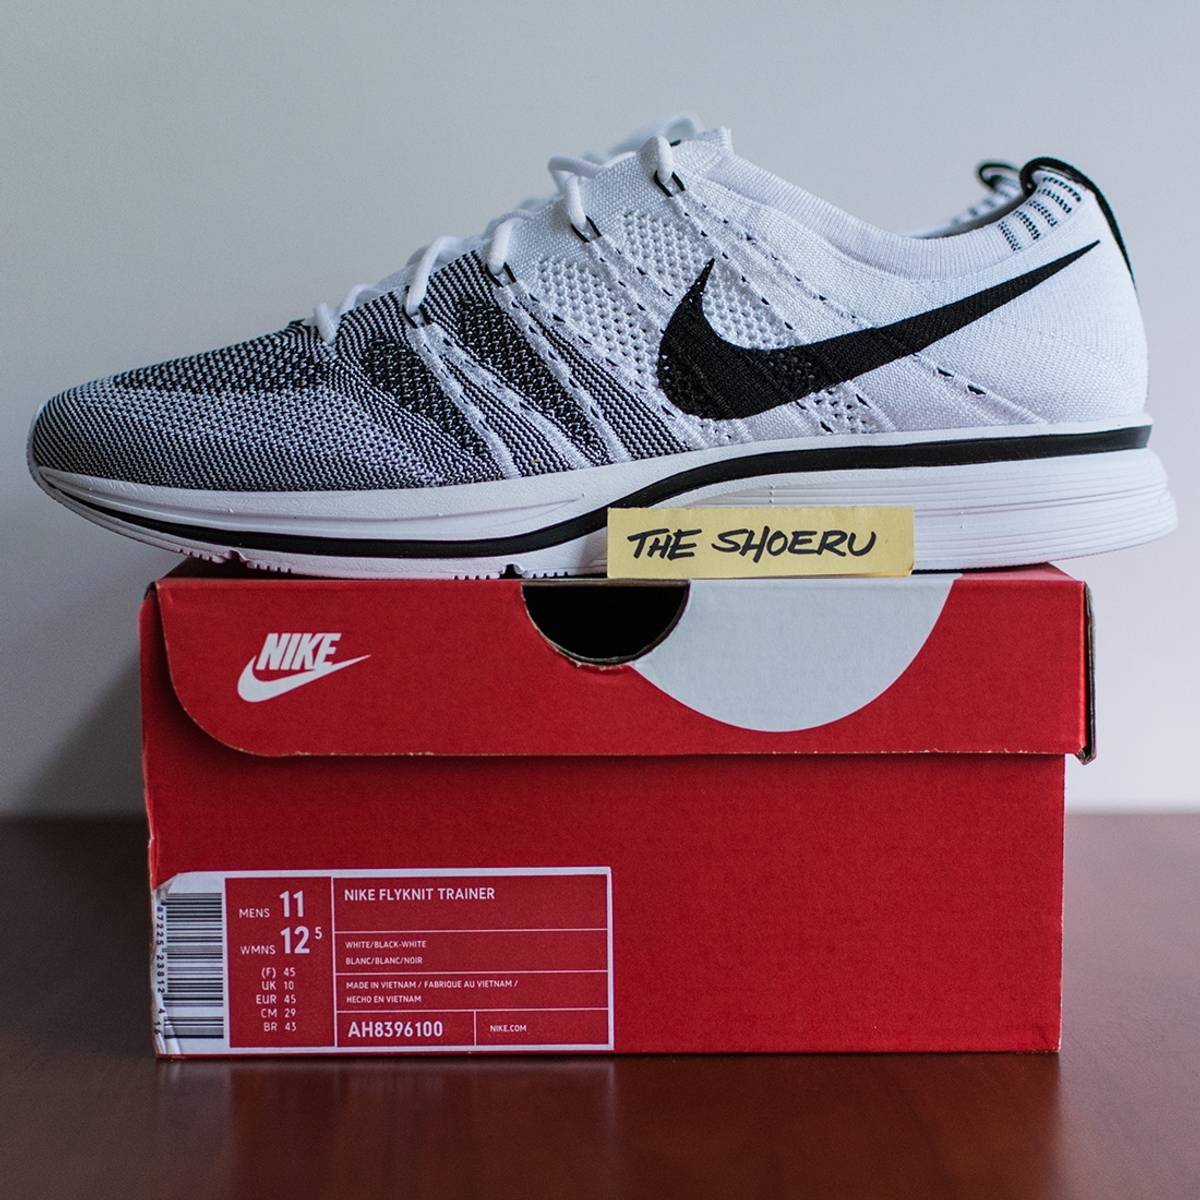 95790aa86e91c Nike Flyknit Trainer - White (AH8396100) Size 11 - Low-Top Sneakers ...